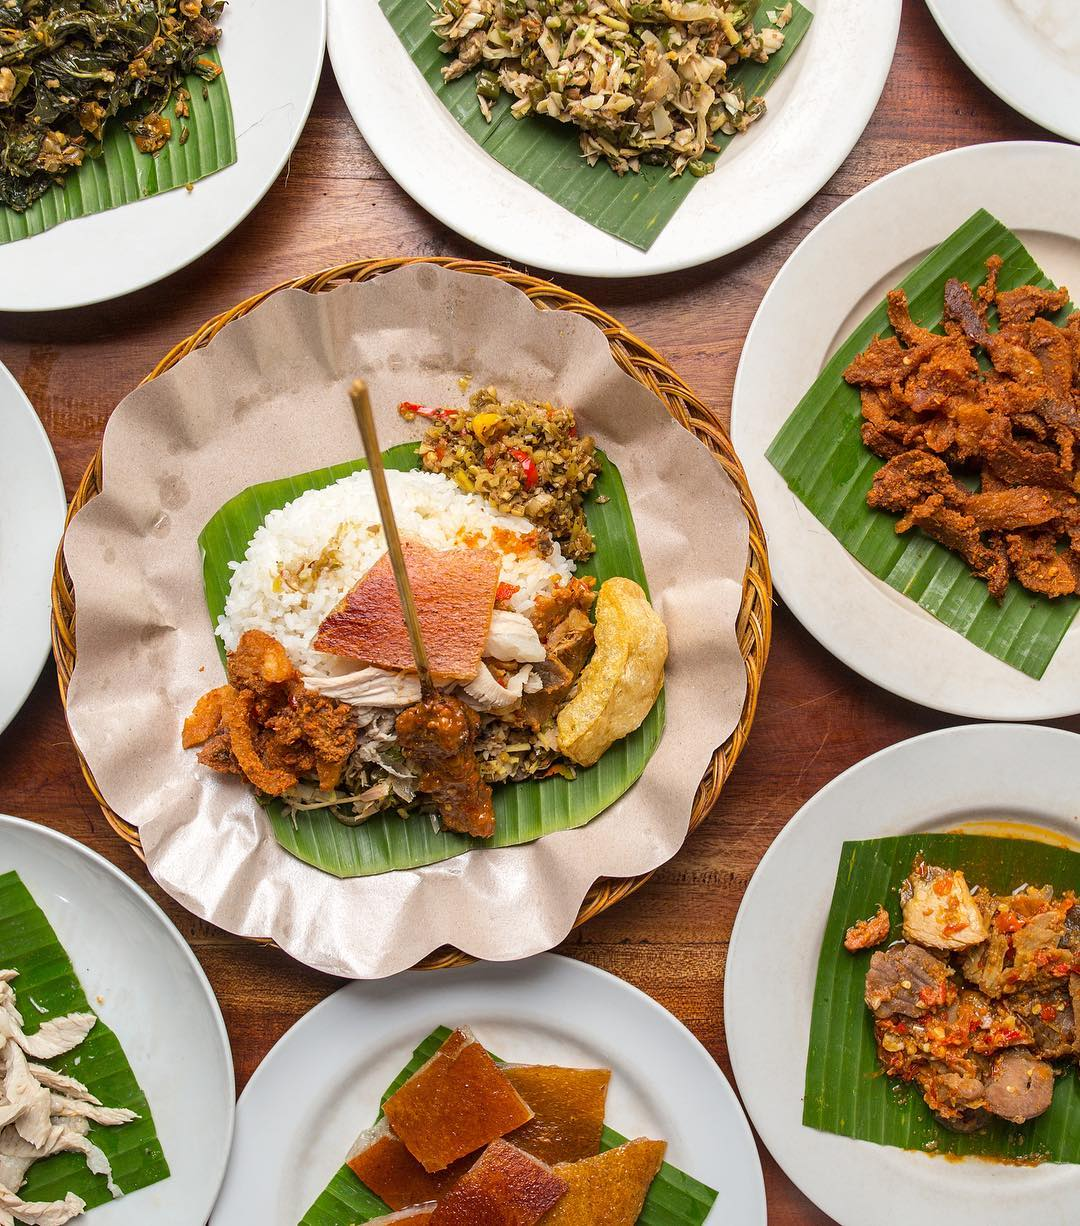 Seminyak Restaurants: Babi Guling Pak Malen by @gofoodbali